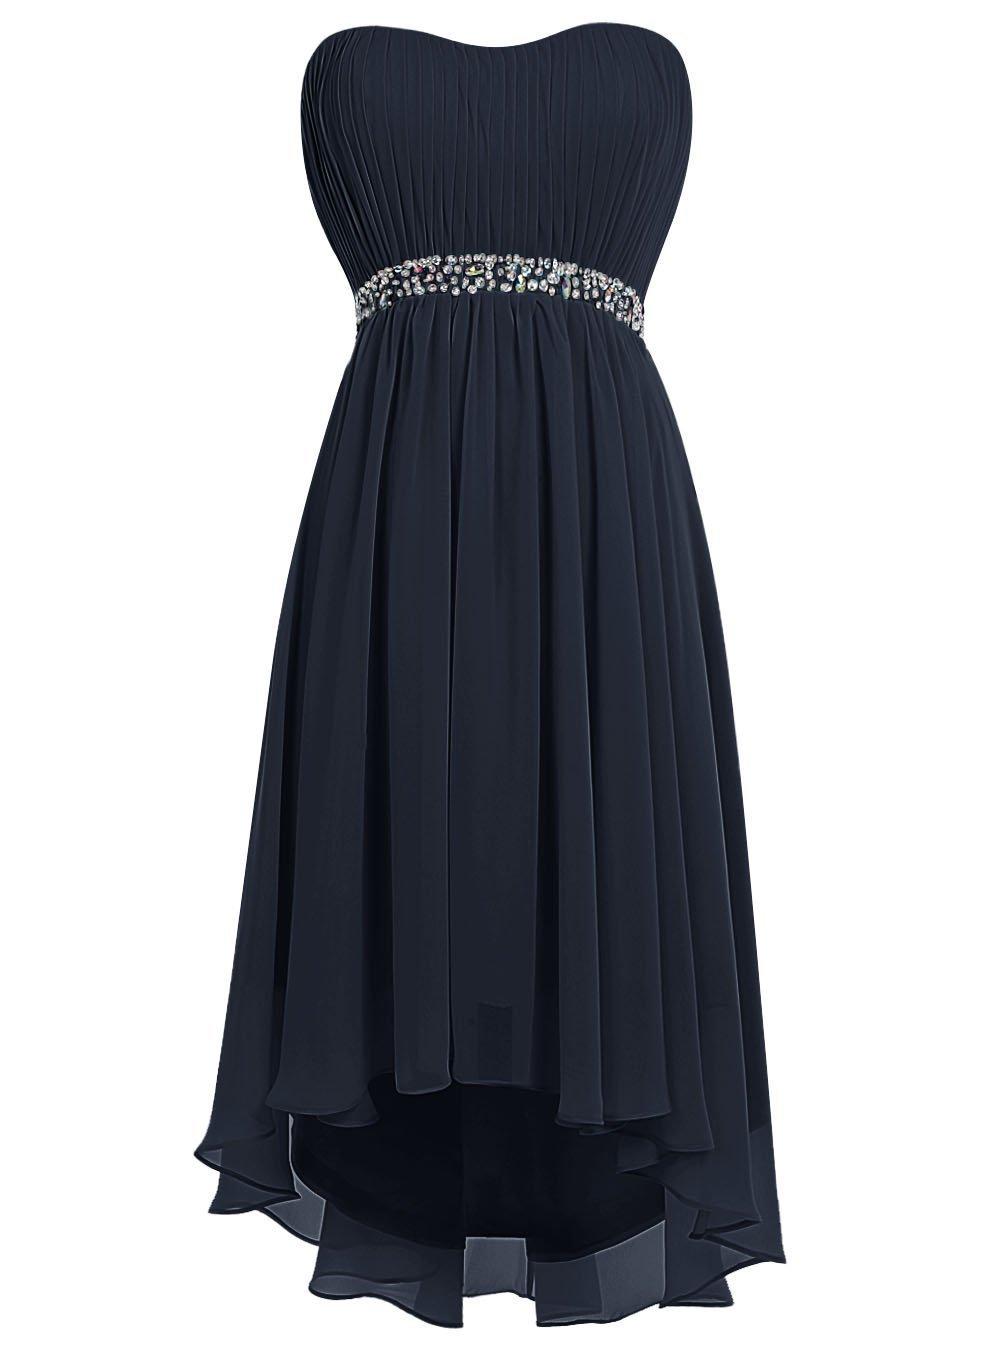 Anna's Bridal Women's High Low Beaded Chiffon Navy Blue Bridesmaid Dresses Short US12